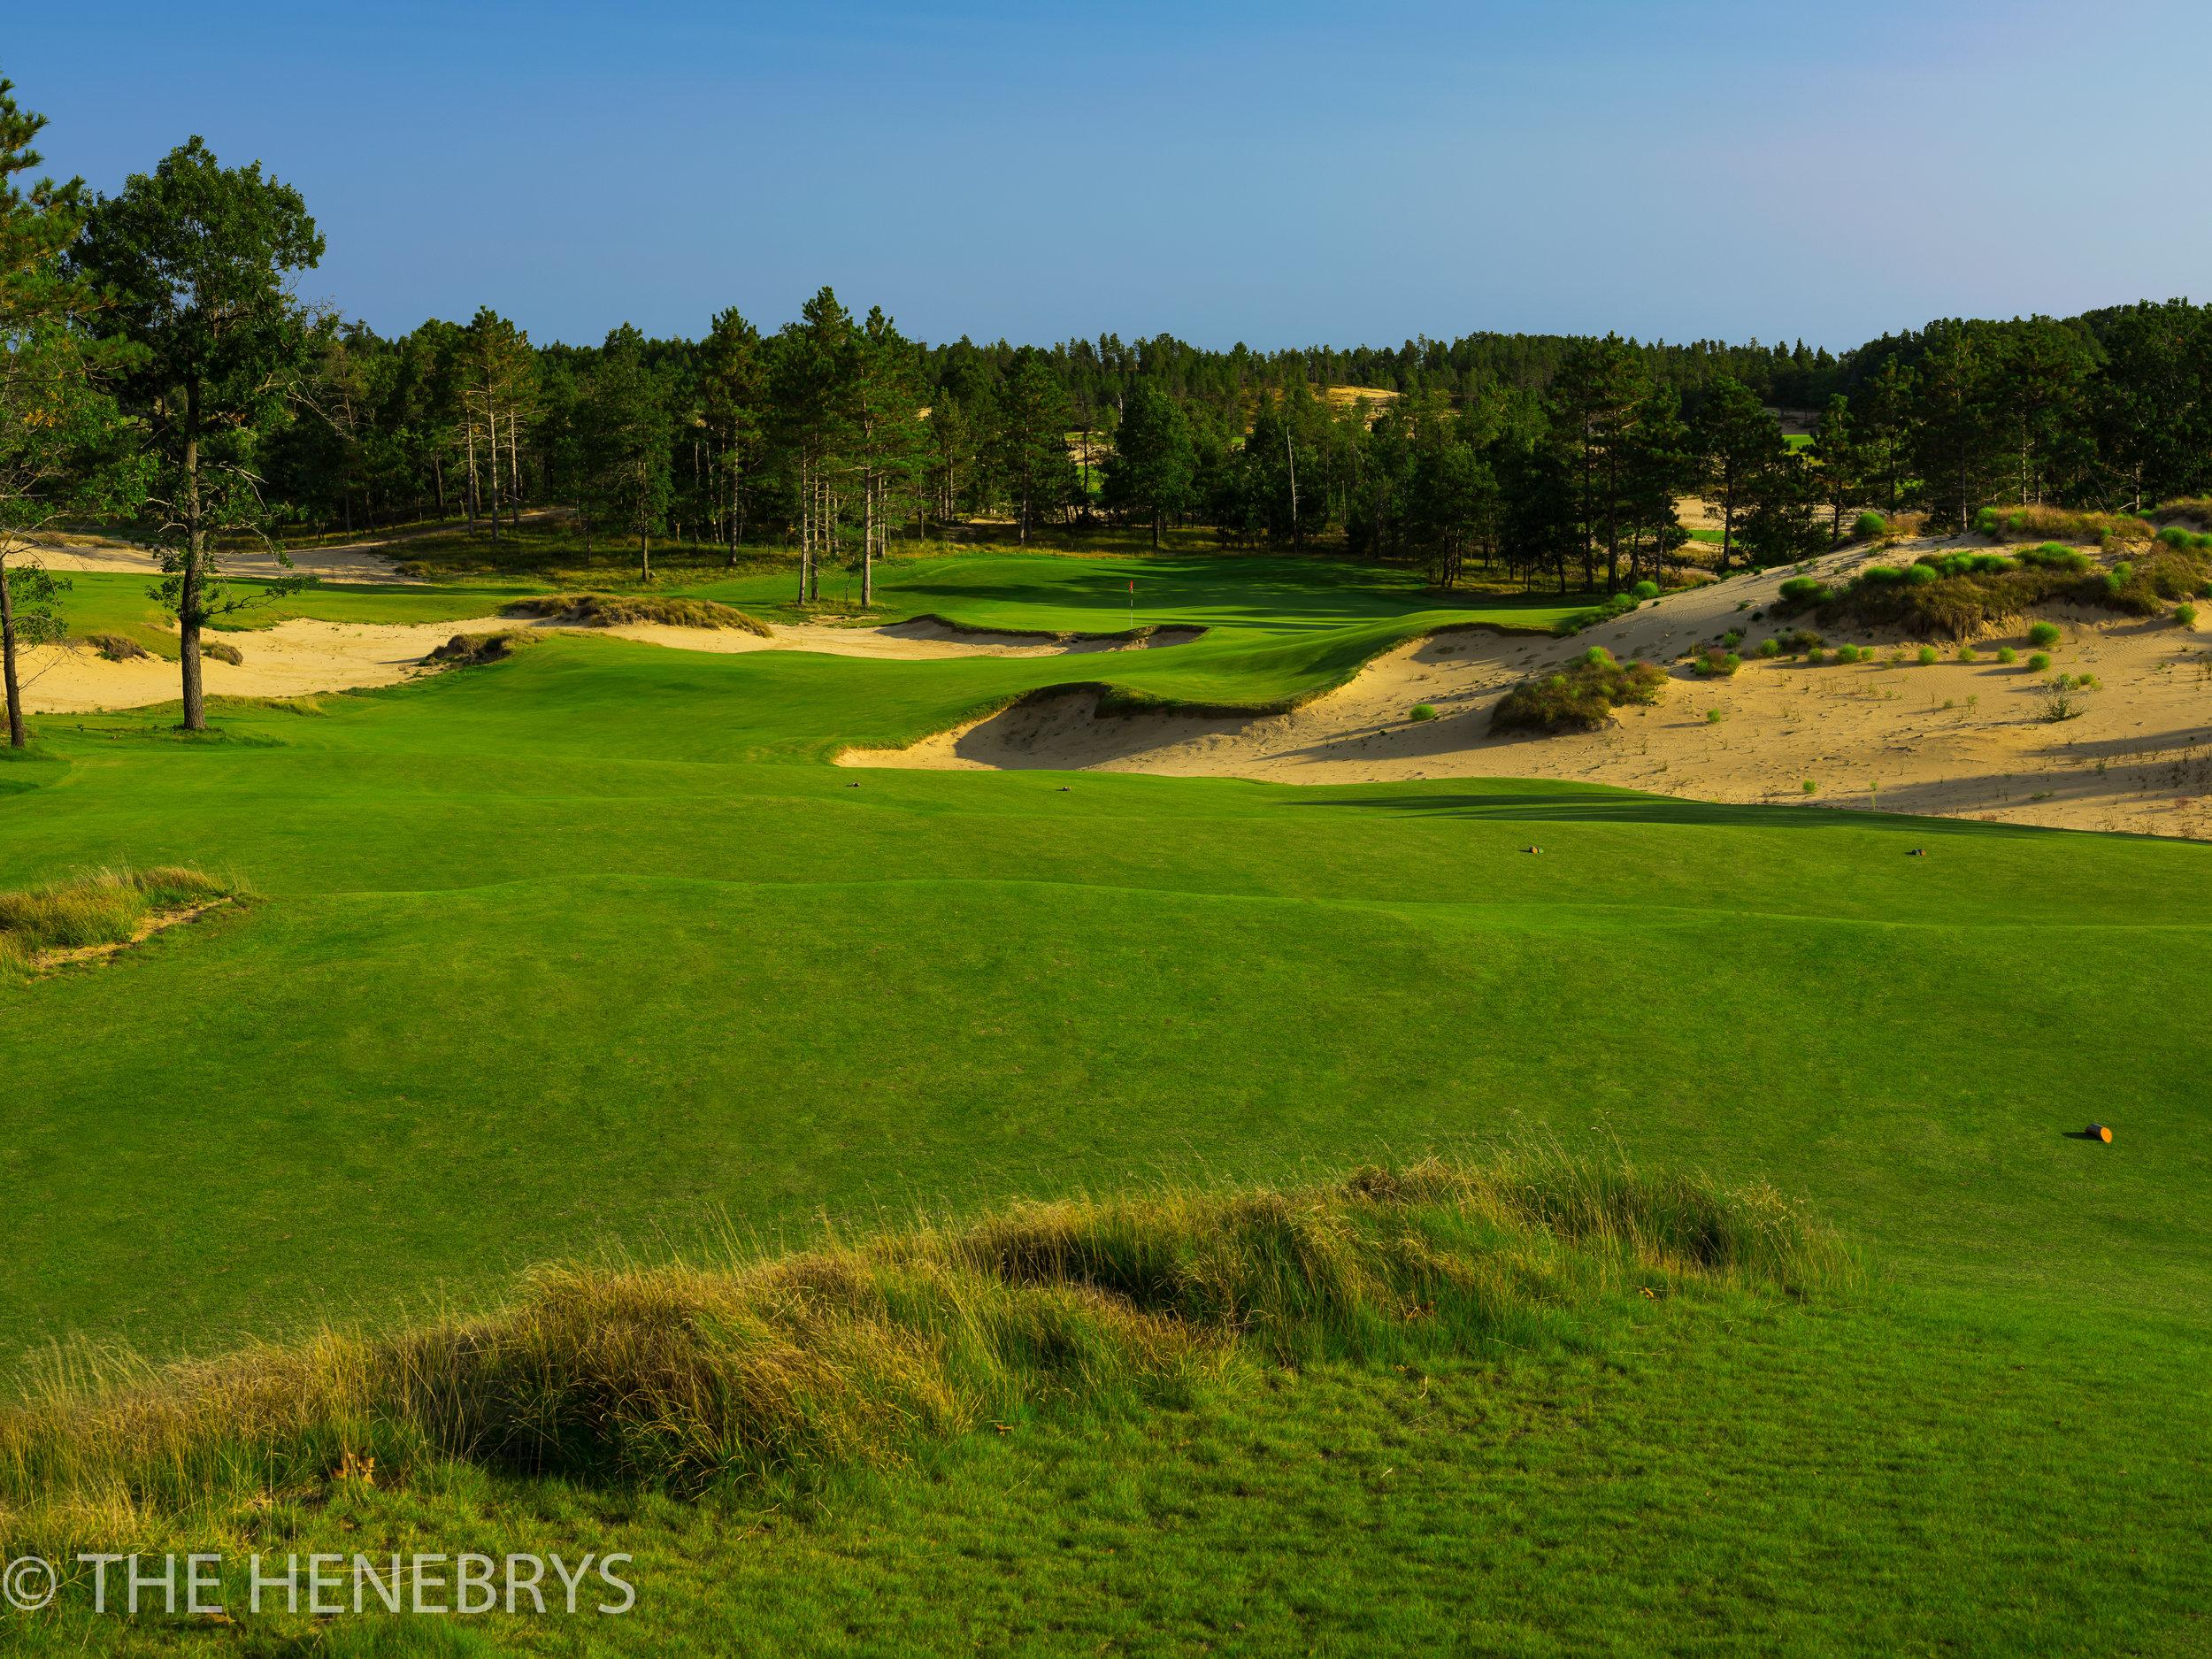 Sand Valley Golf Resort, Mammoth Dunes Course #16, Nekoosa, Wisconsin